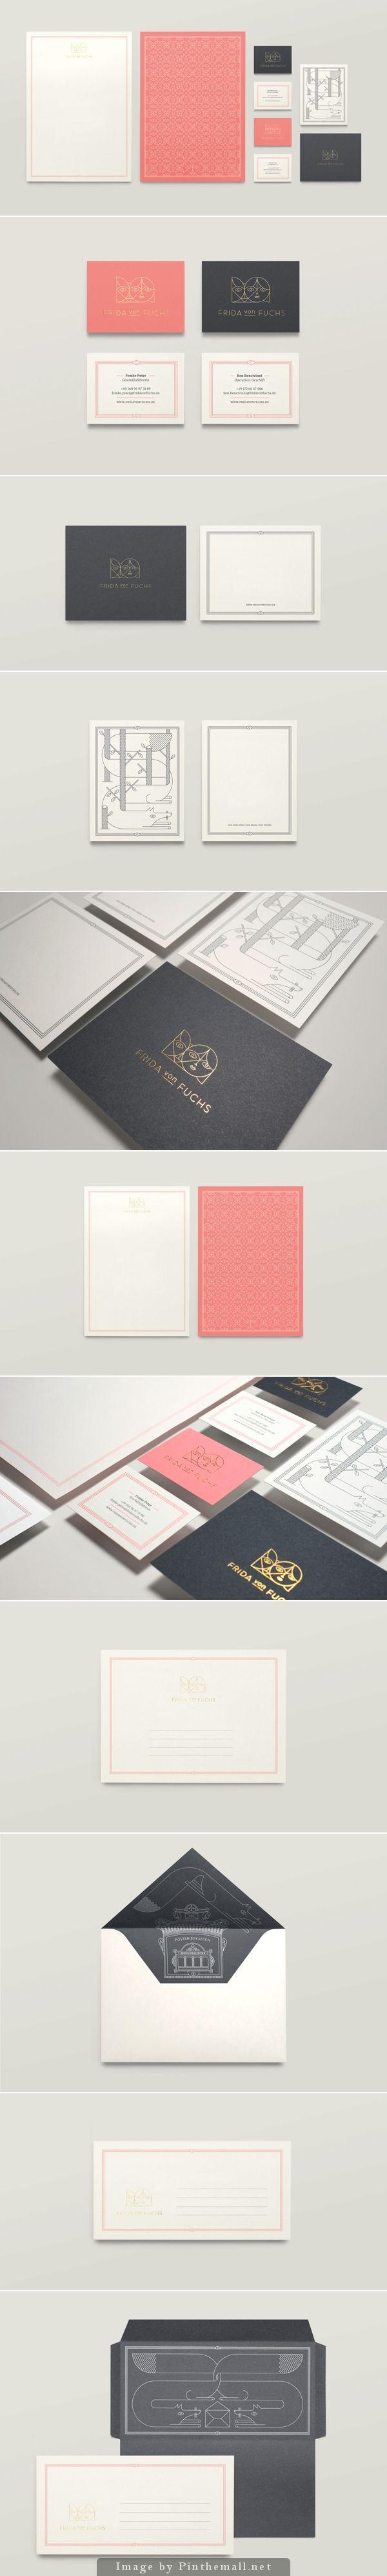 Corporate identity branding business card letterpress notebook minimal illustration vintage paper gold foil stationary grid fox graphic design